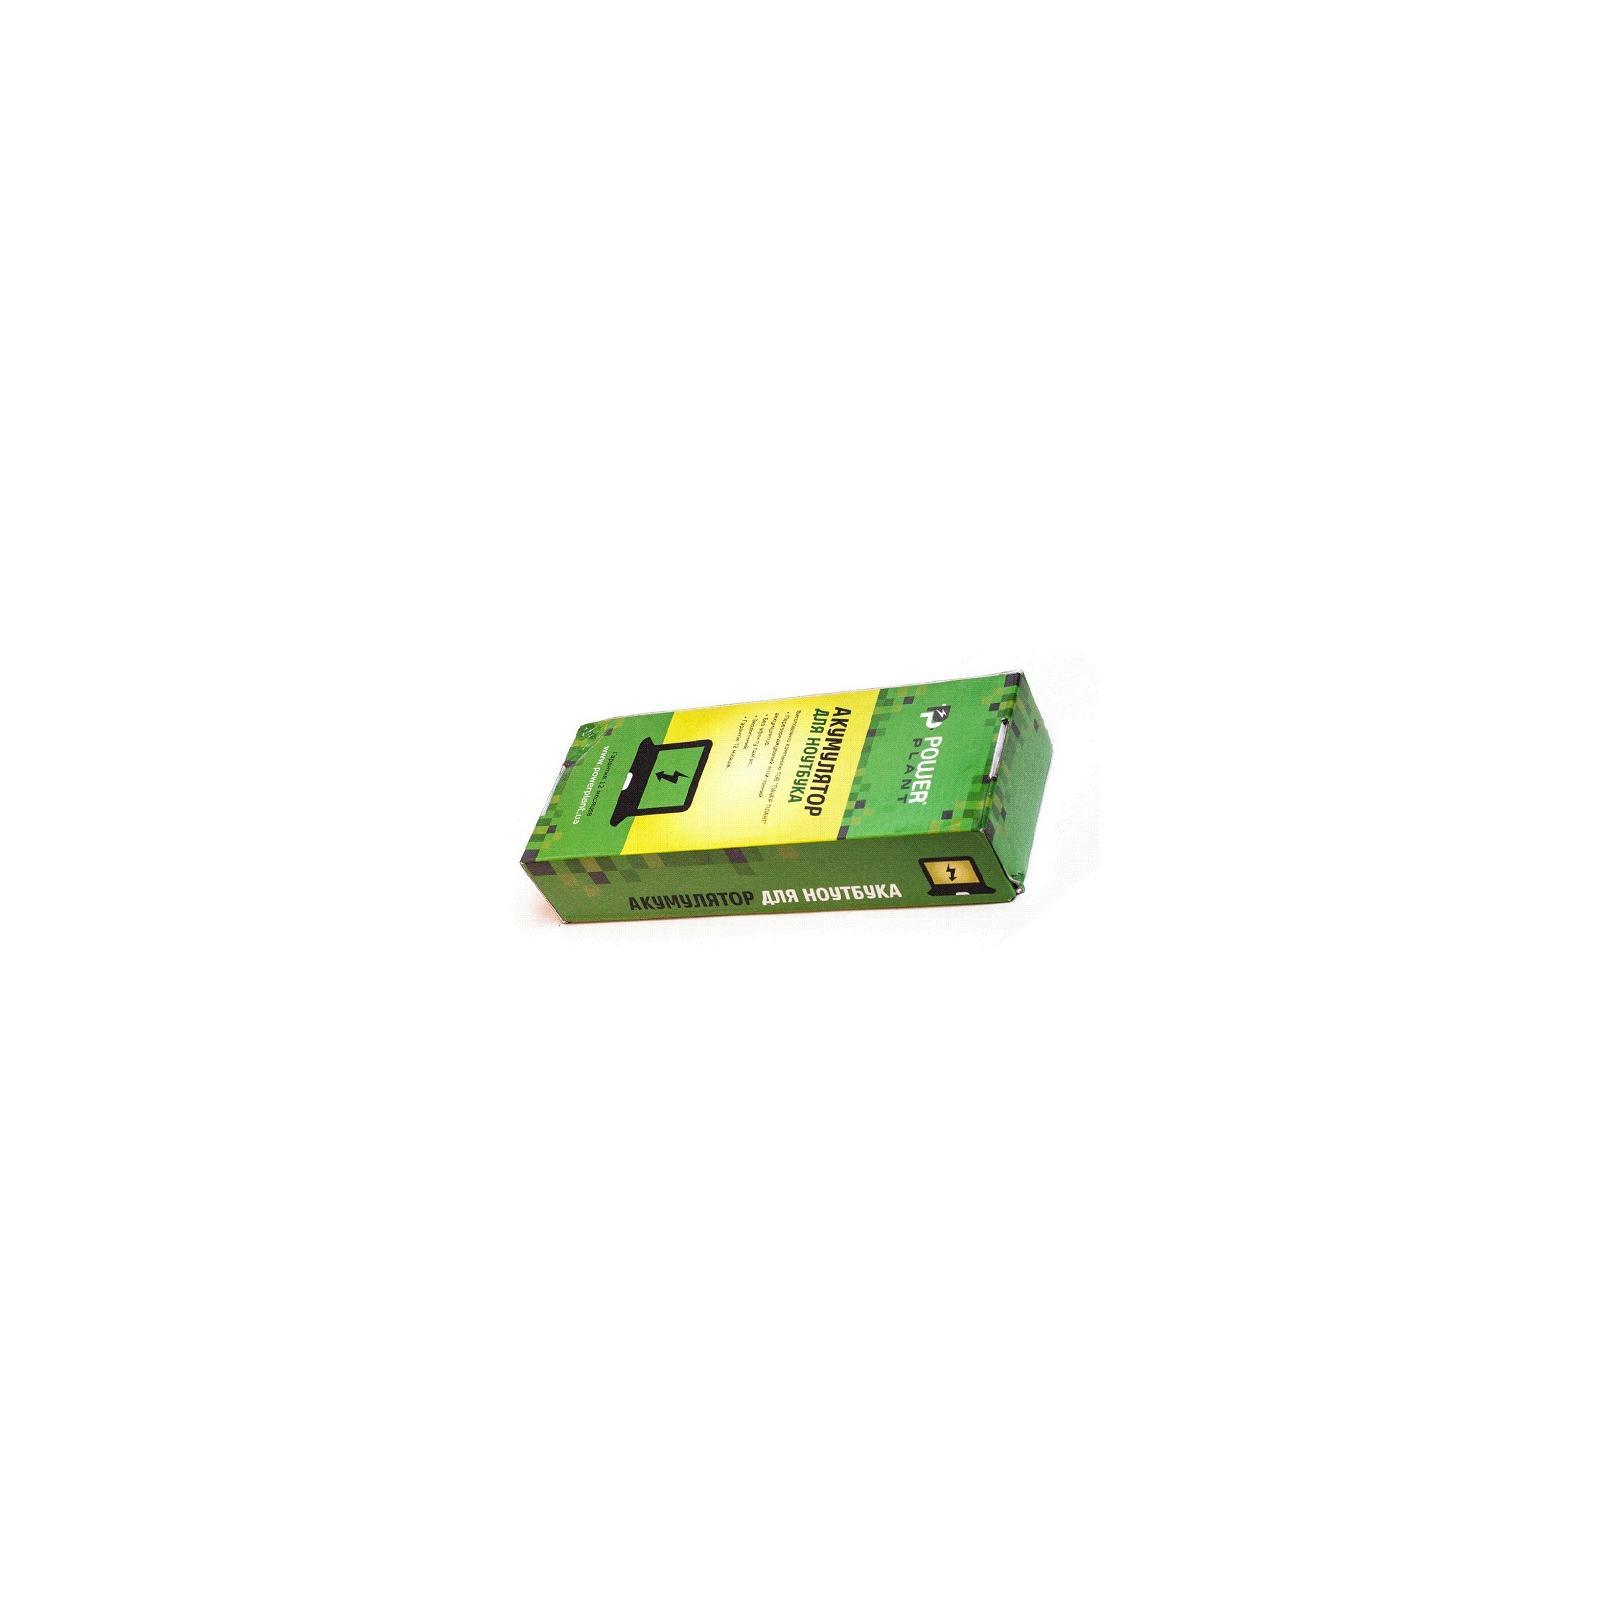 Аккумулятор для ноутбука HP 6730s (HSTNN-IB51, H6720 3S2P) 10.8V 5200mAh PowerPlant (NB00000017) изображение 3